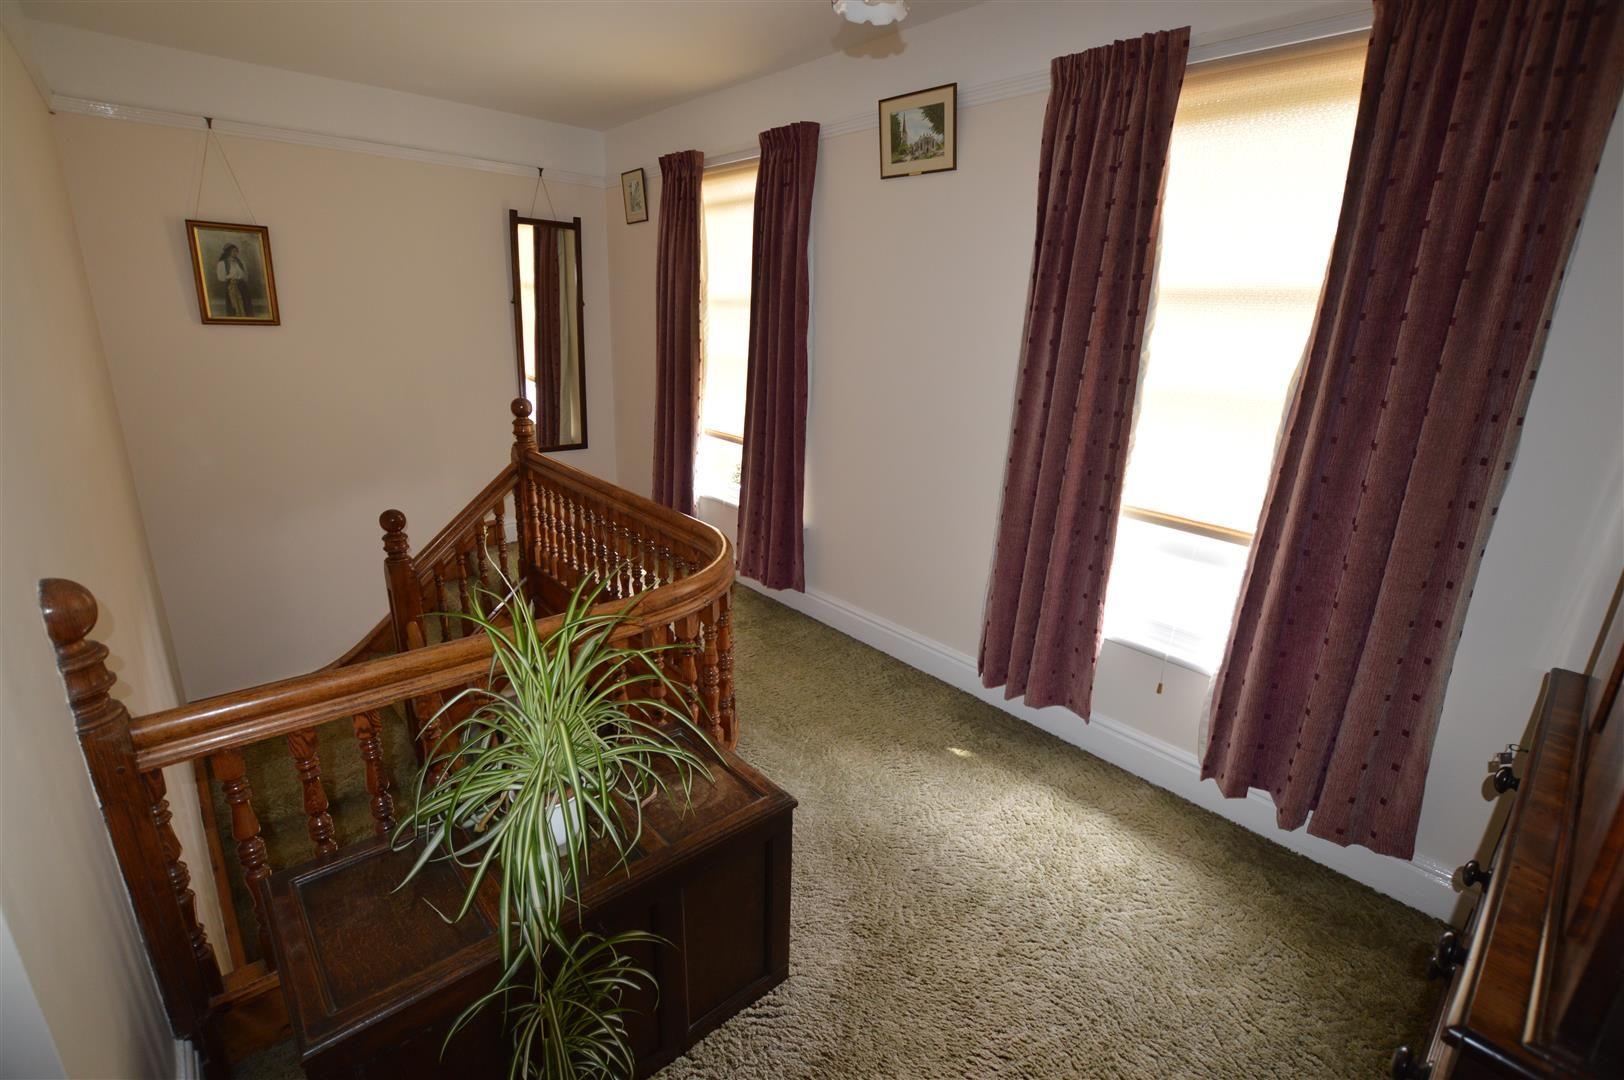 6 bed detached for sale in Leominster  - Property Image 5